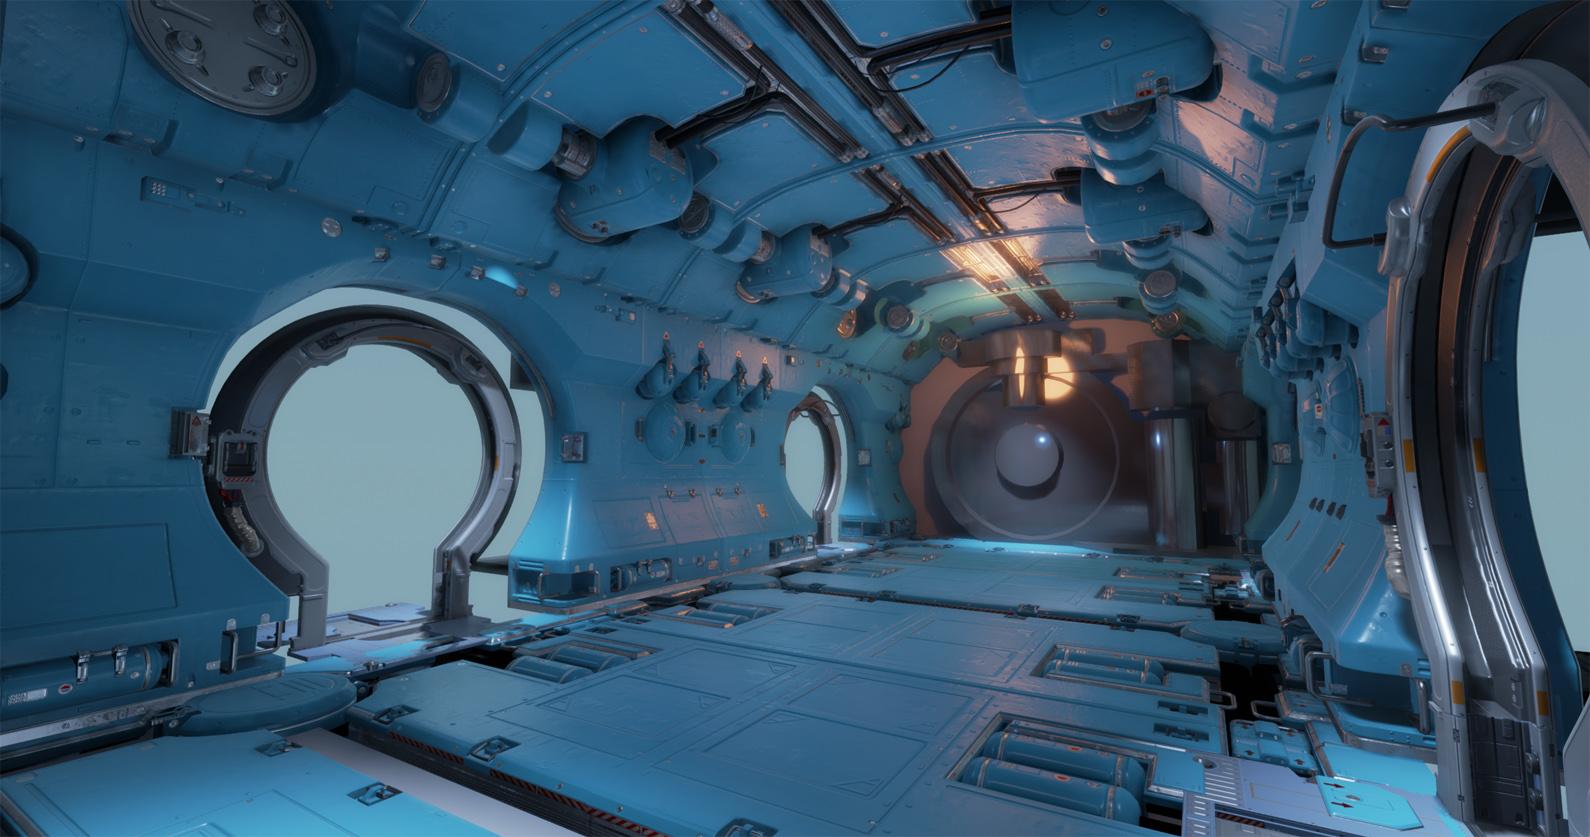 spaceman art 3d design - photo #22